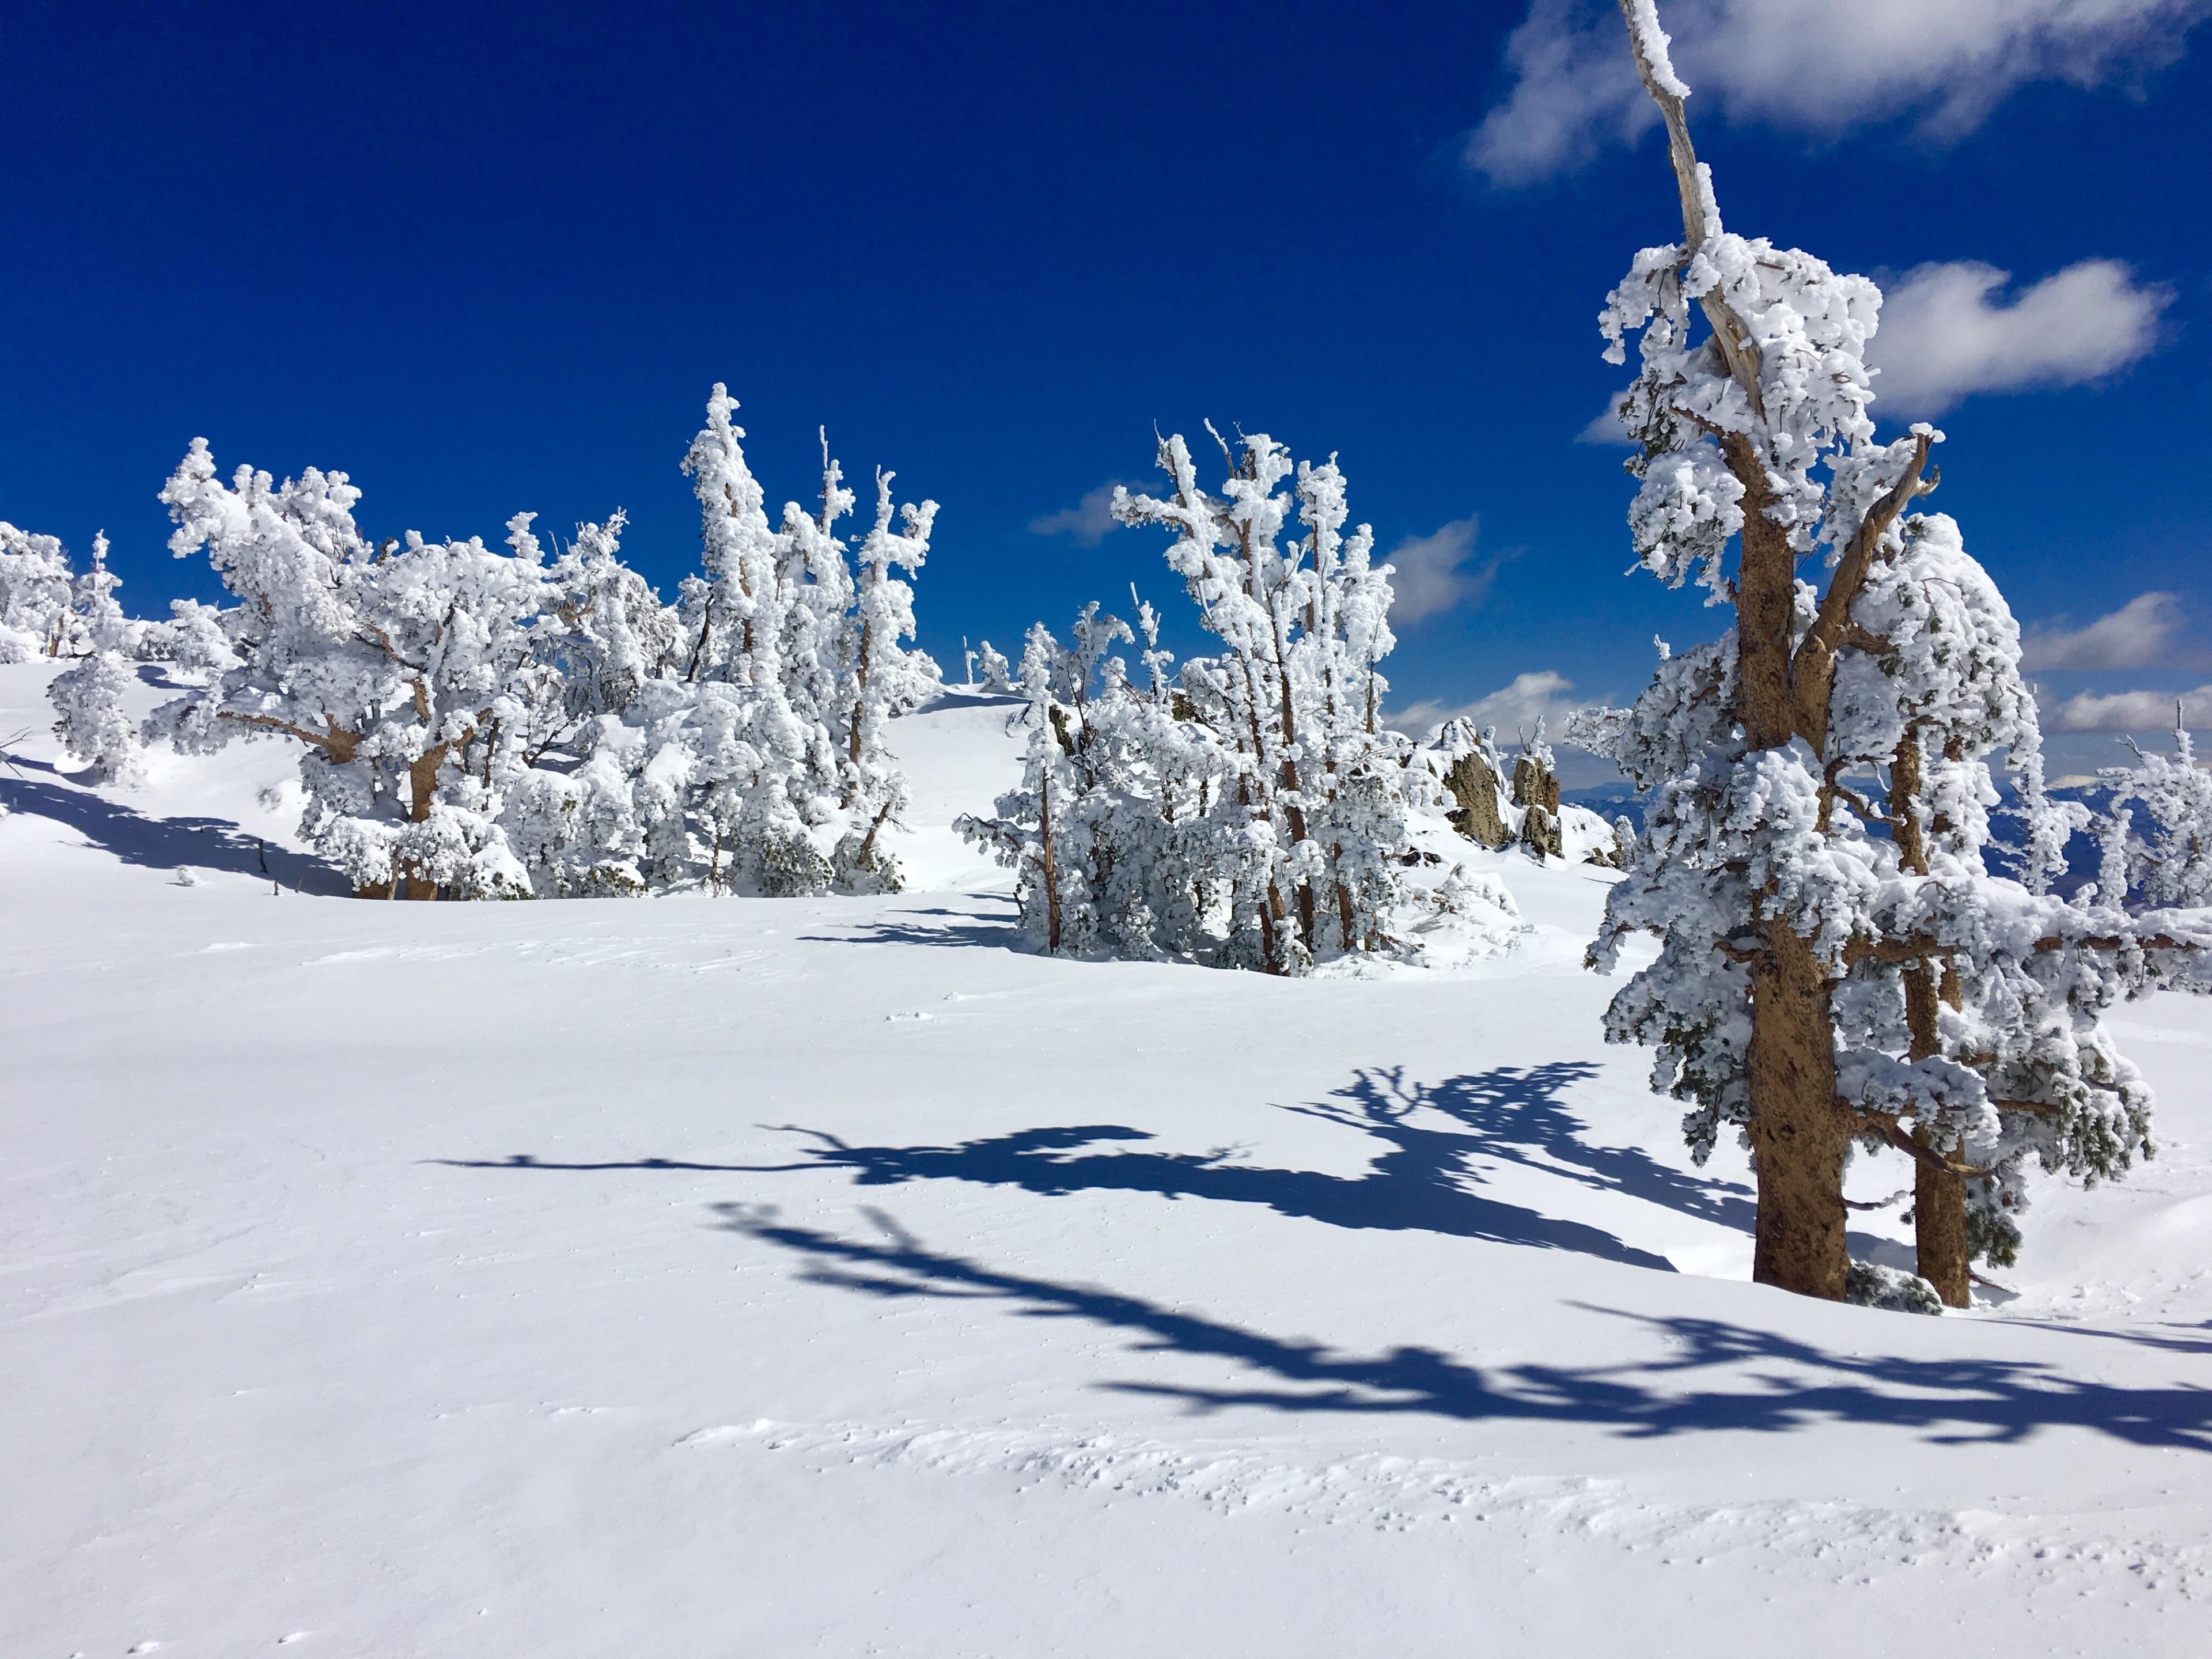 Mt. Rose Ski Tahoe, Reno, Nevada, United States of America